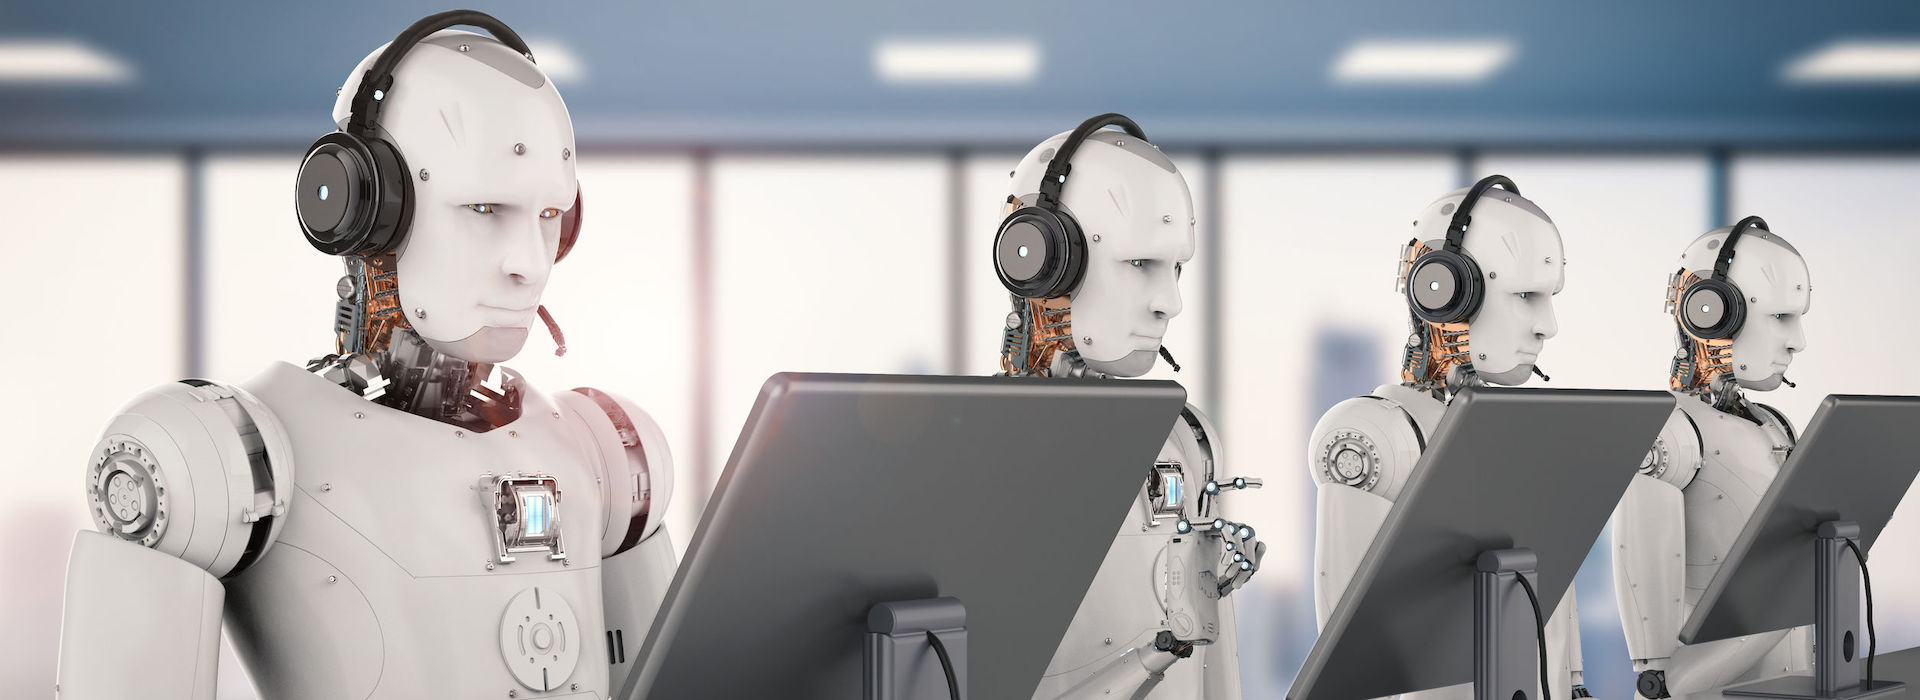 Machine-Learning-Roboter-3 Kopie